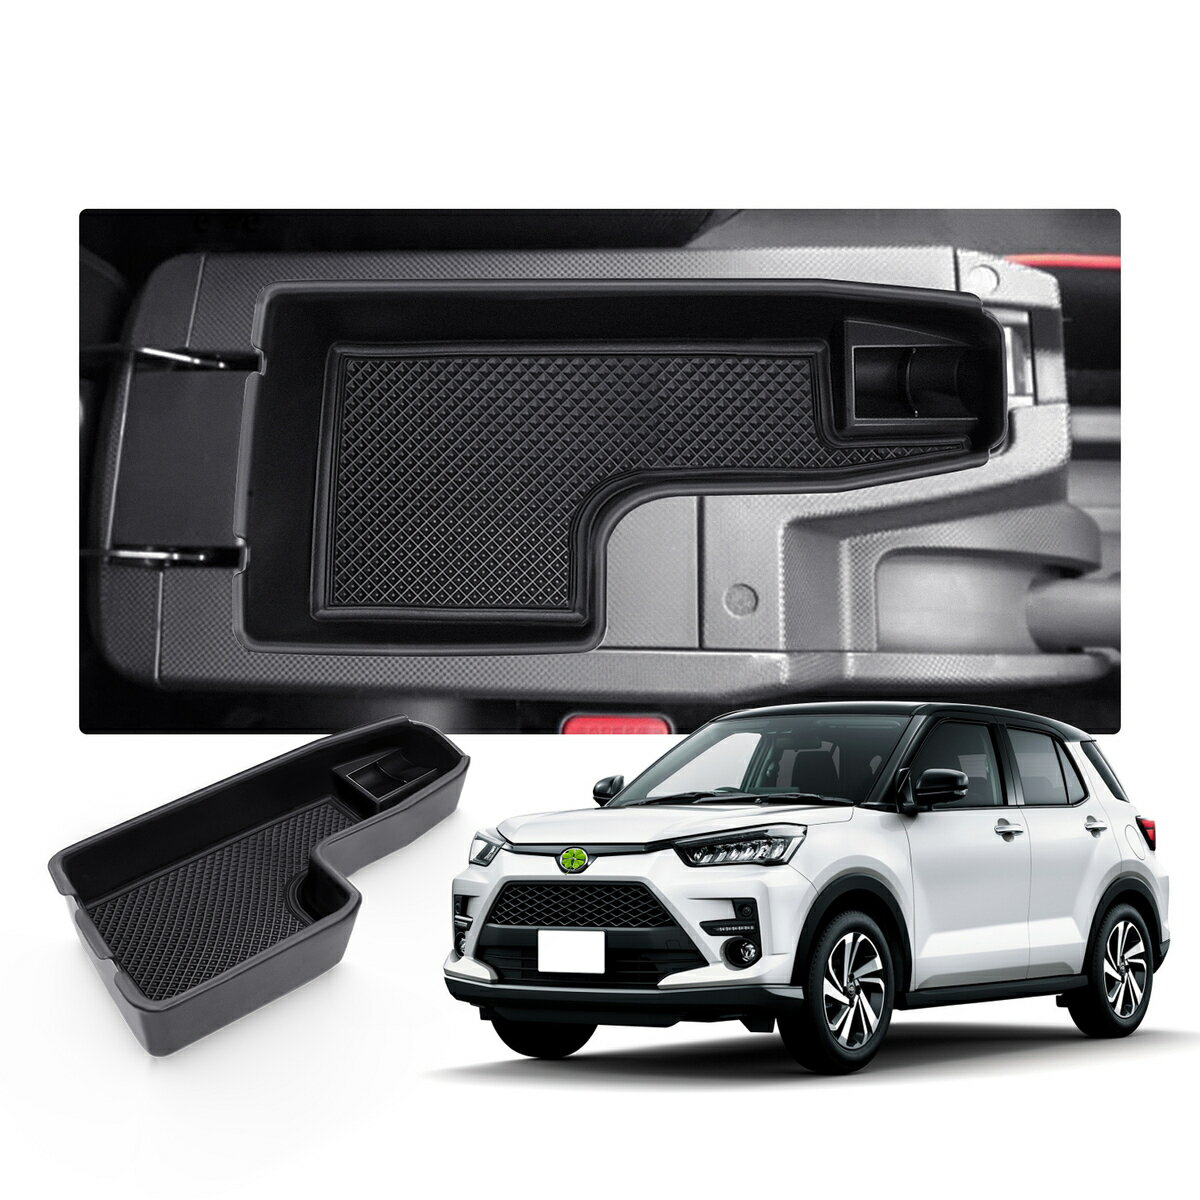 【RUIYA 送料無料!】 トヨタ ライズ(Toyota Rise RAIZE A200A / A210A 2019+) 対応 センターコンソール コンソールトレイ 小物入れ 4色画像